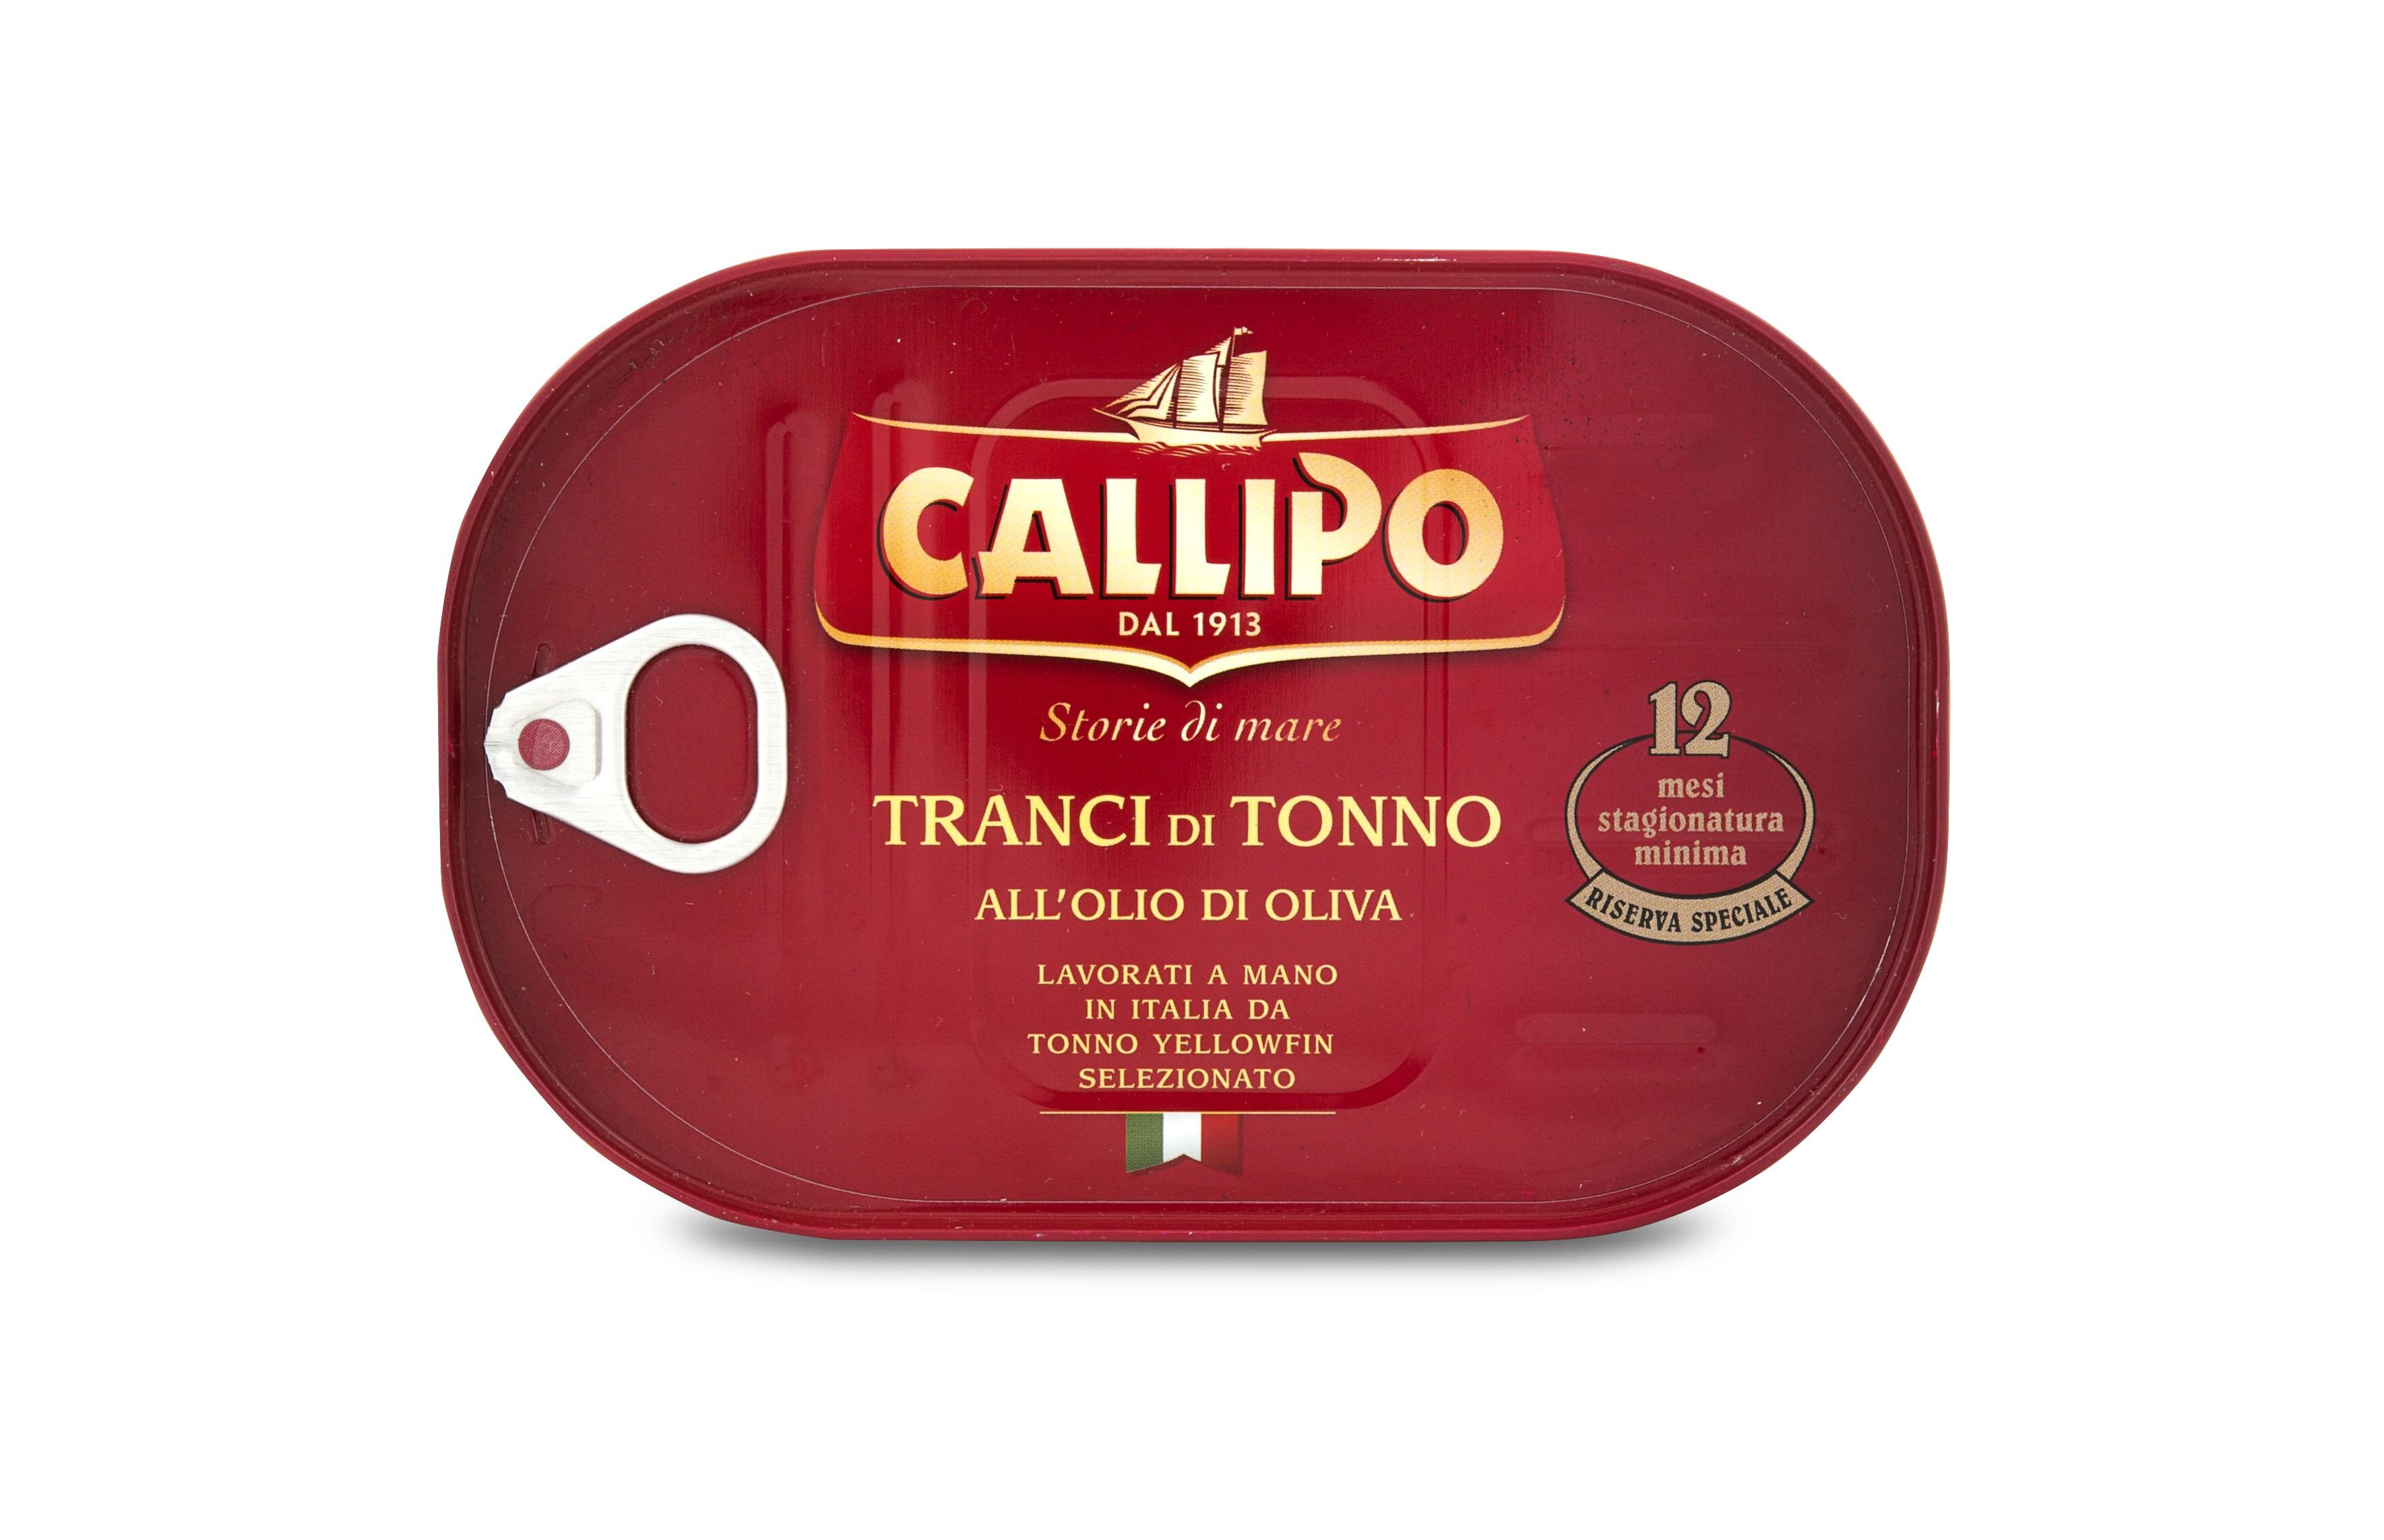 Тунец в оливковом масле Callipo фото